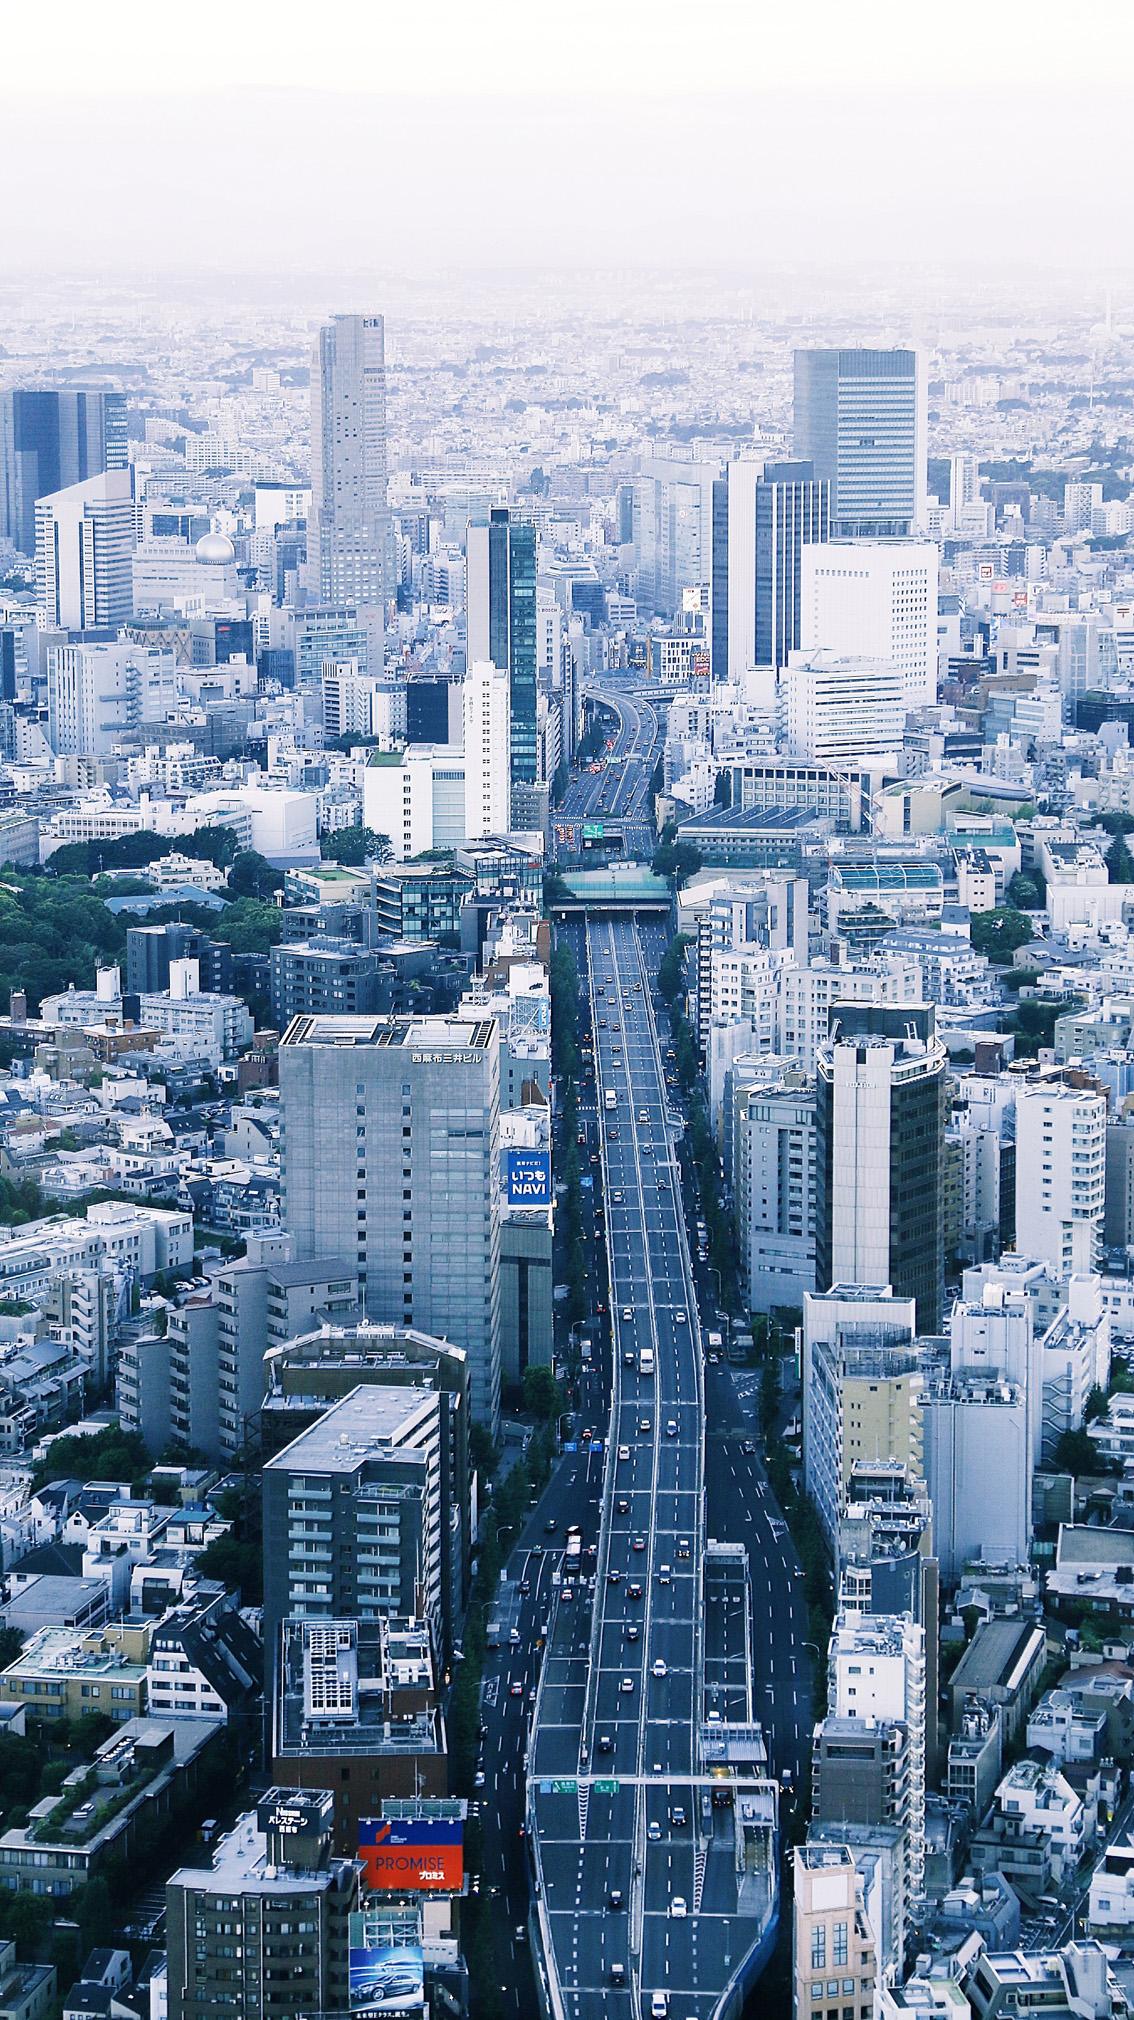 12-1 Giappotour: last day in Tokyo. Ueno, Ginza, Akihabara and Roppongi Hills.